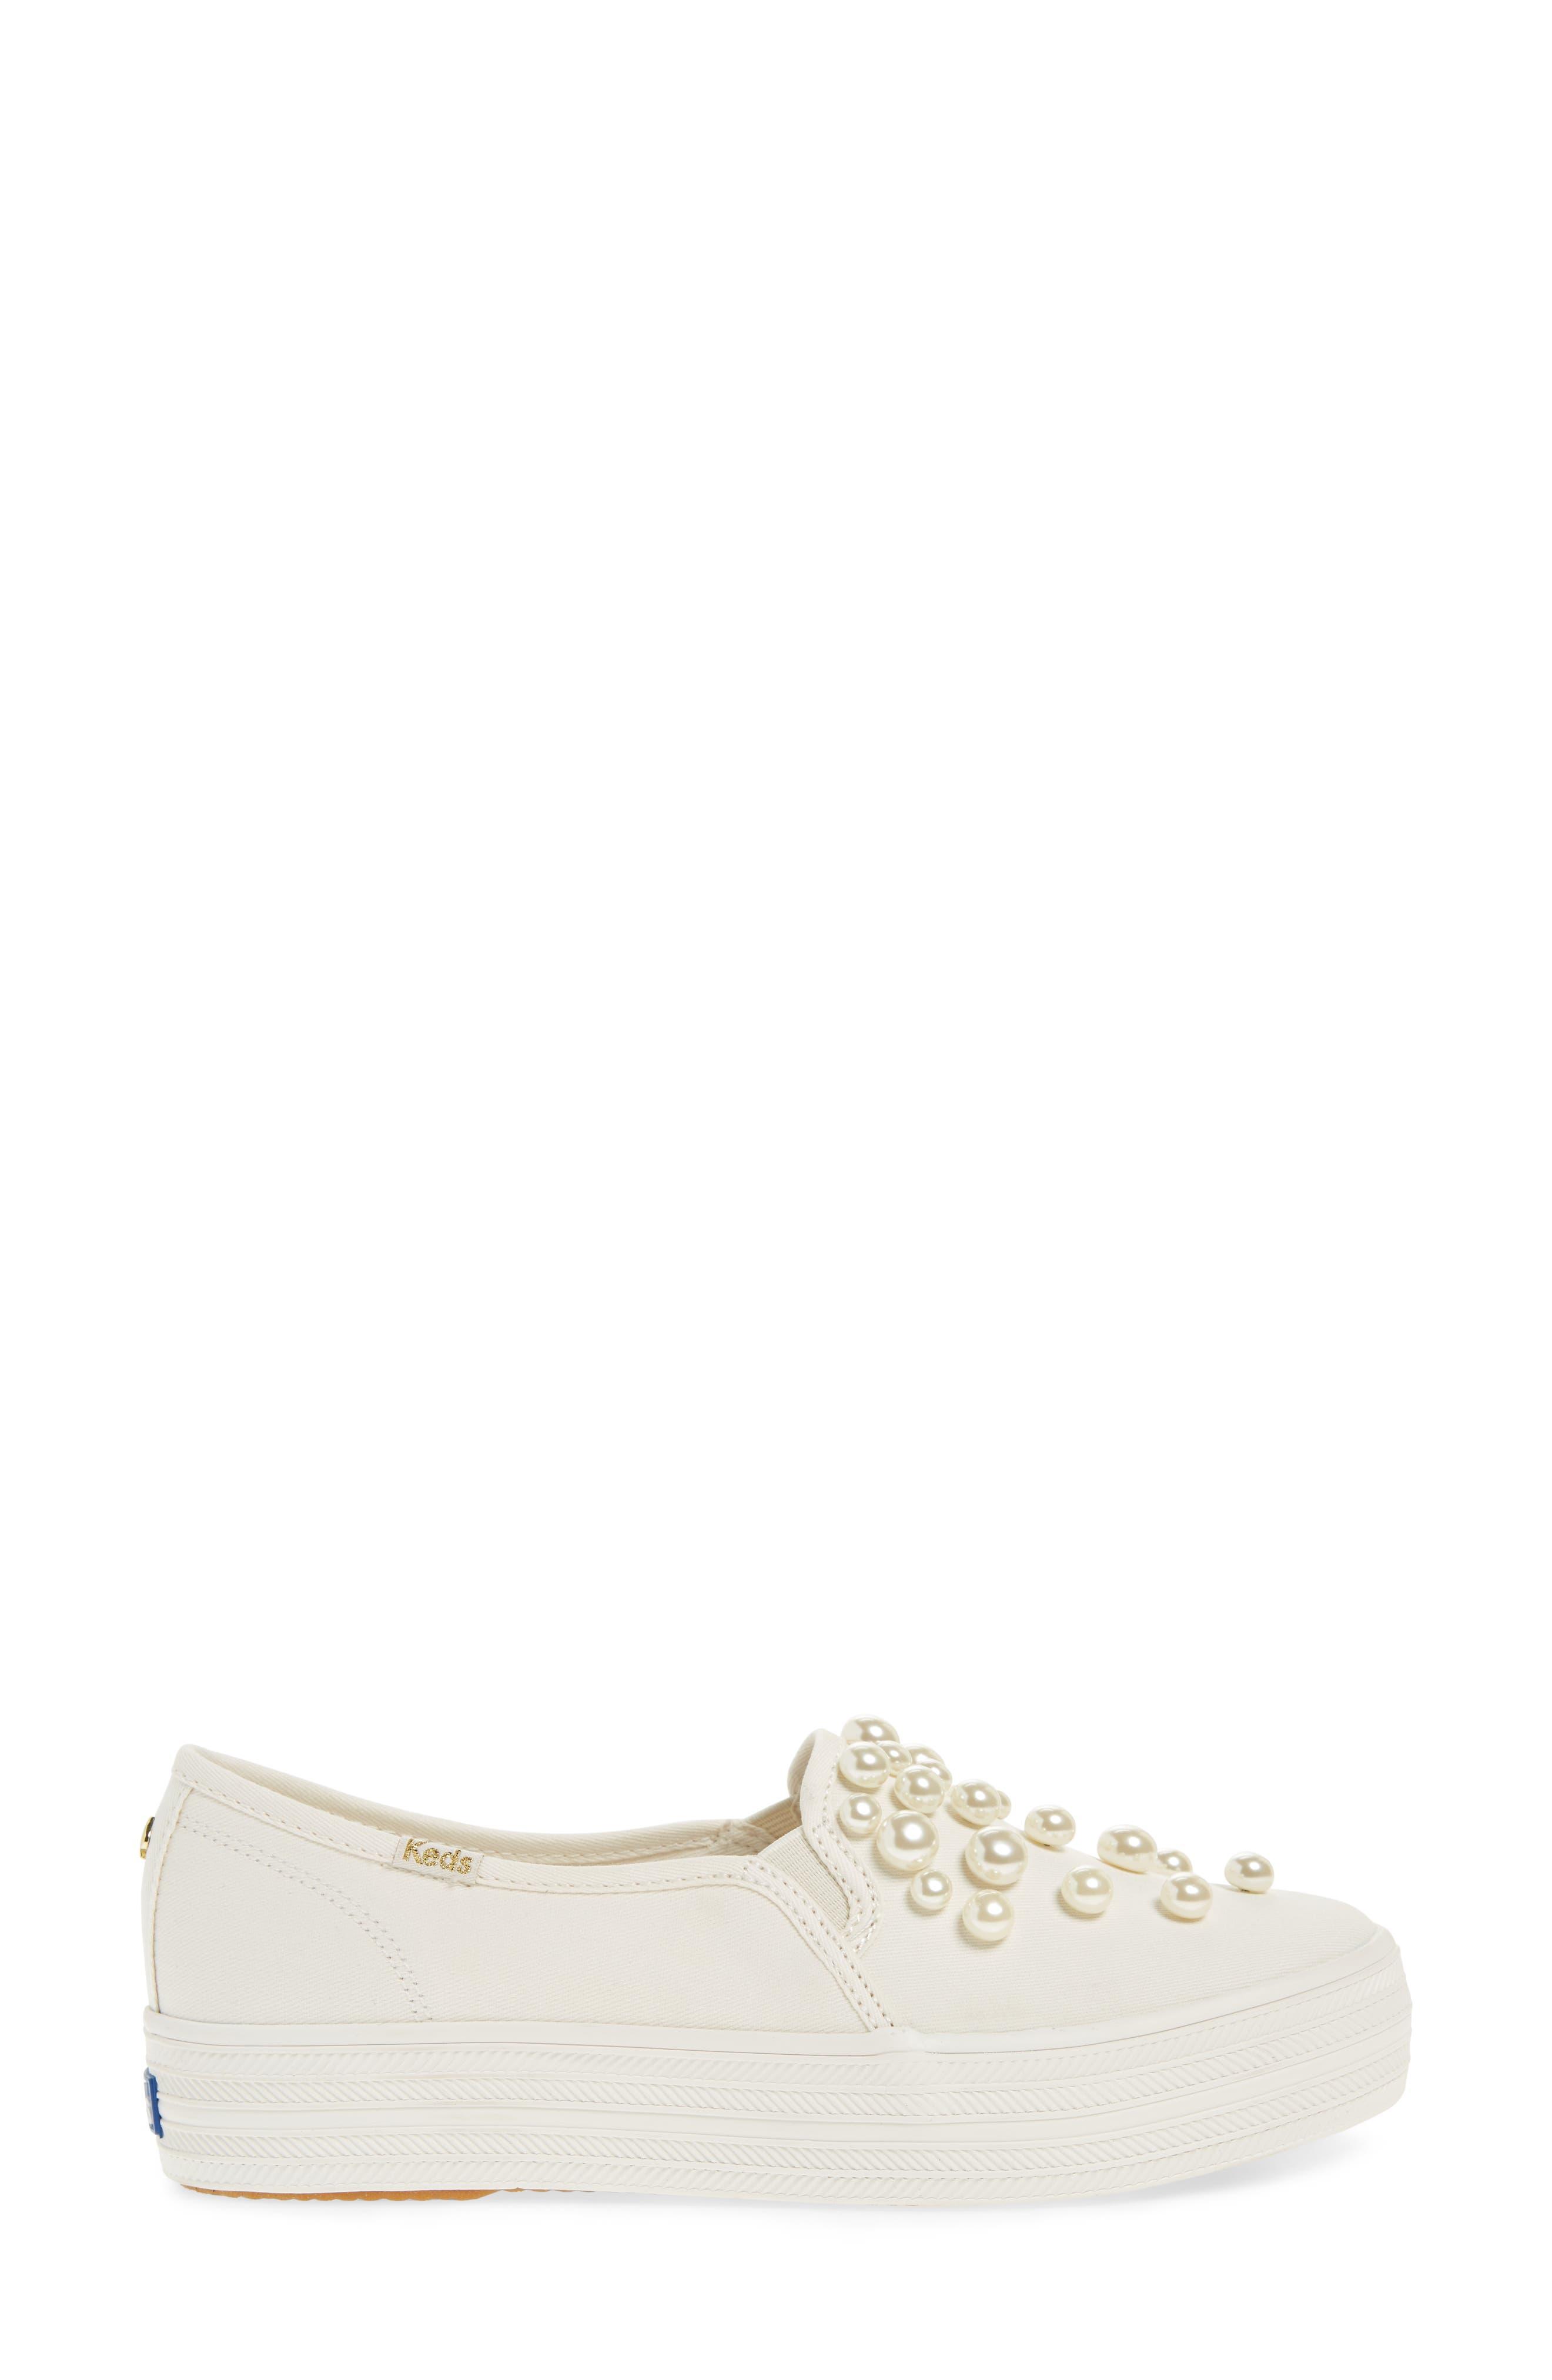 KEDS<SUP>®</SUP> FOR KATE SPADE NEW YORK, triple decker embellished slip-on sneaker, Alternate thumbnail 3, color, CREAM